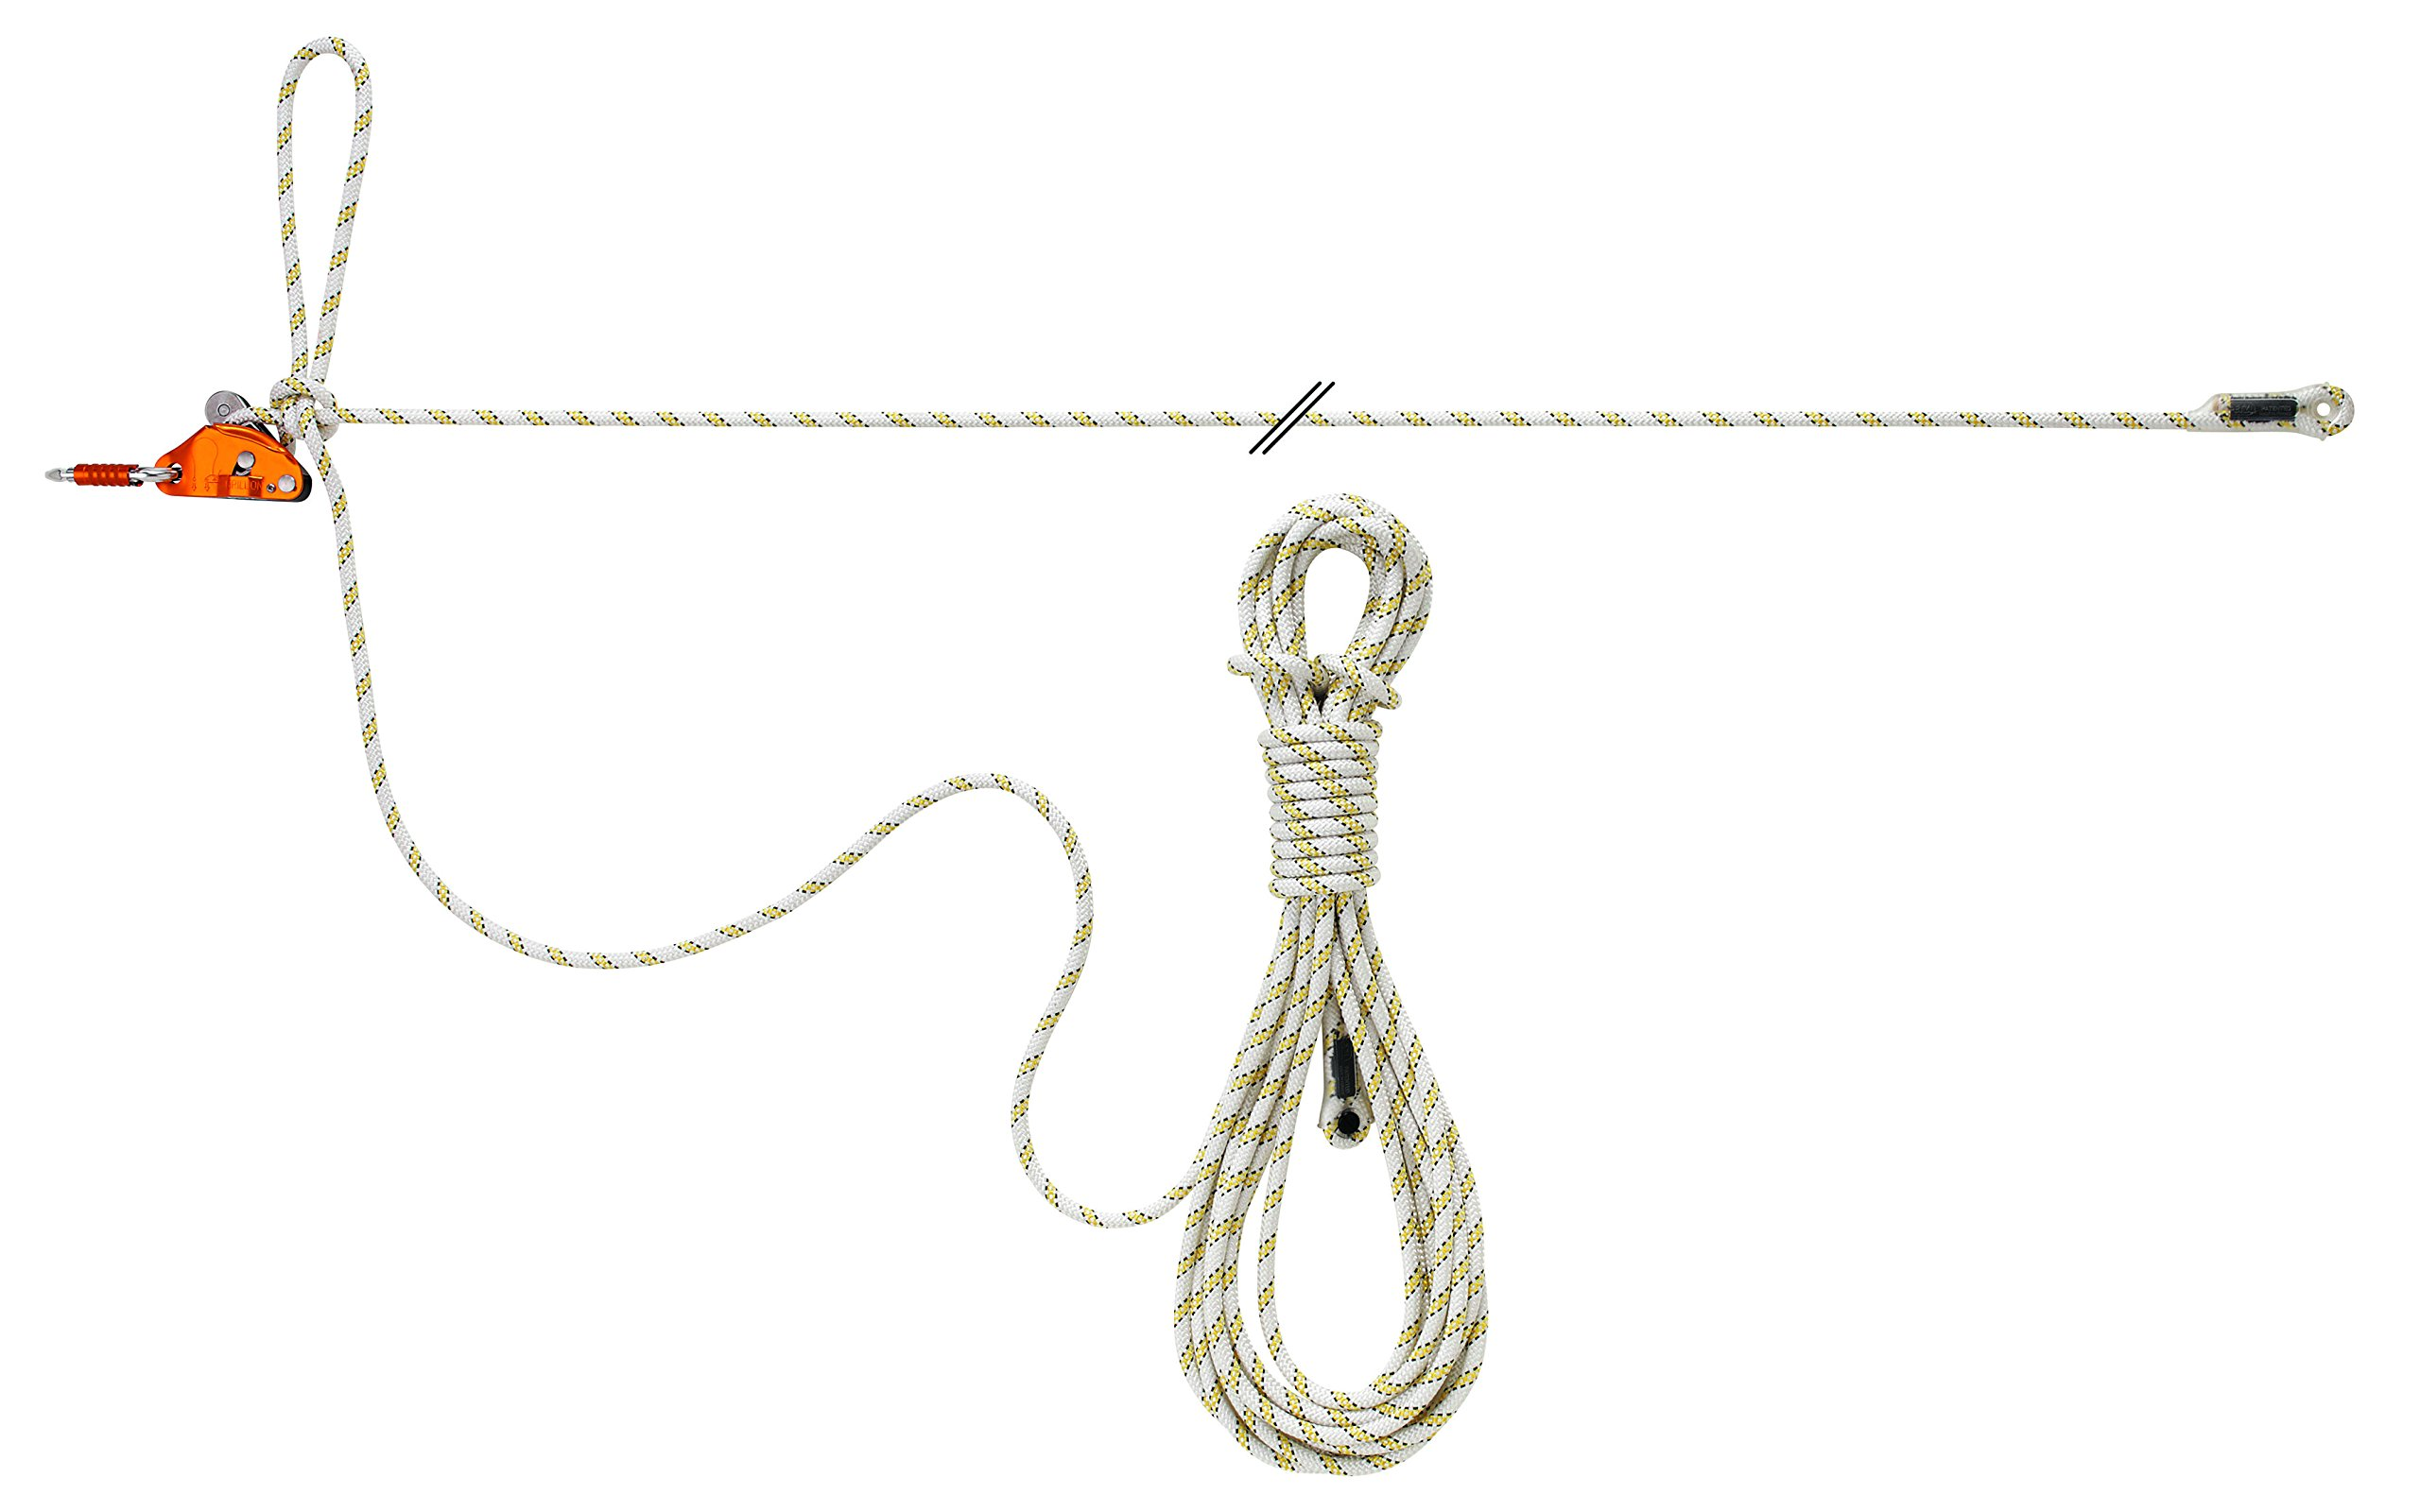 PETZL - GRILLON Lifeline, Temporary Horizontal Lifeline, 10 m